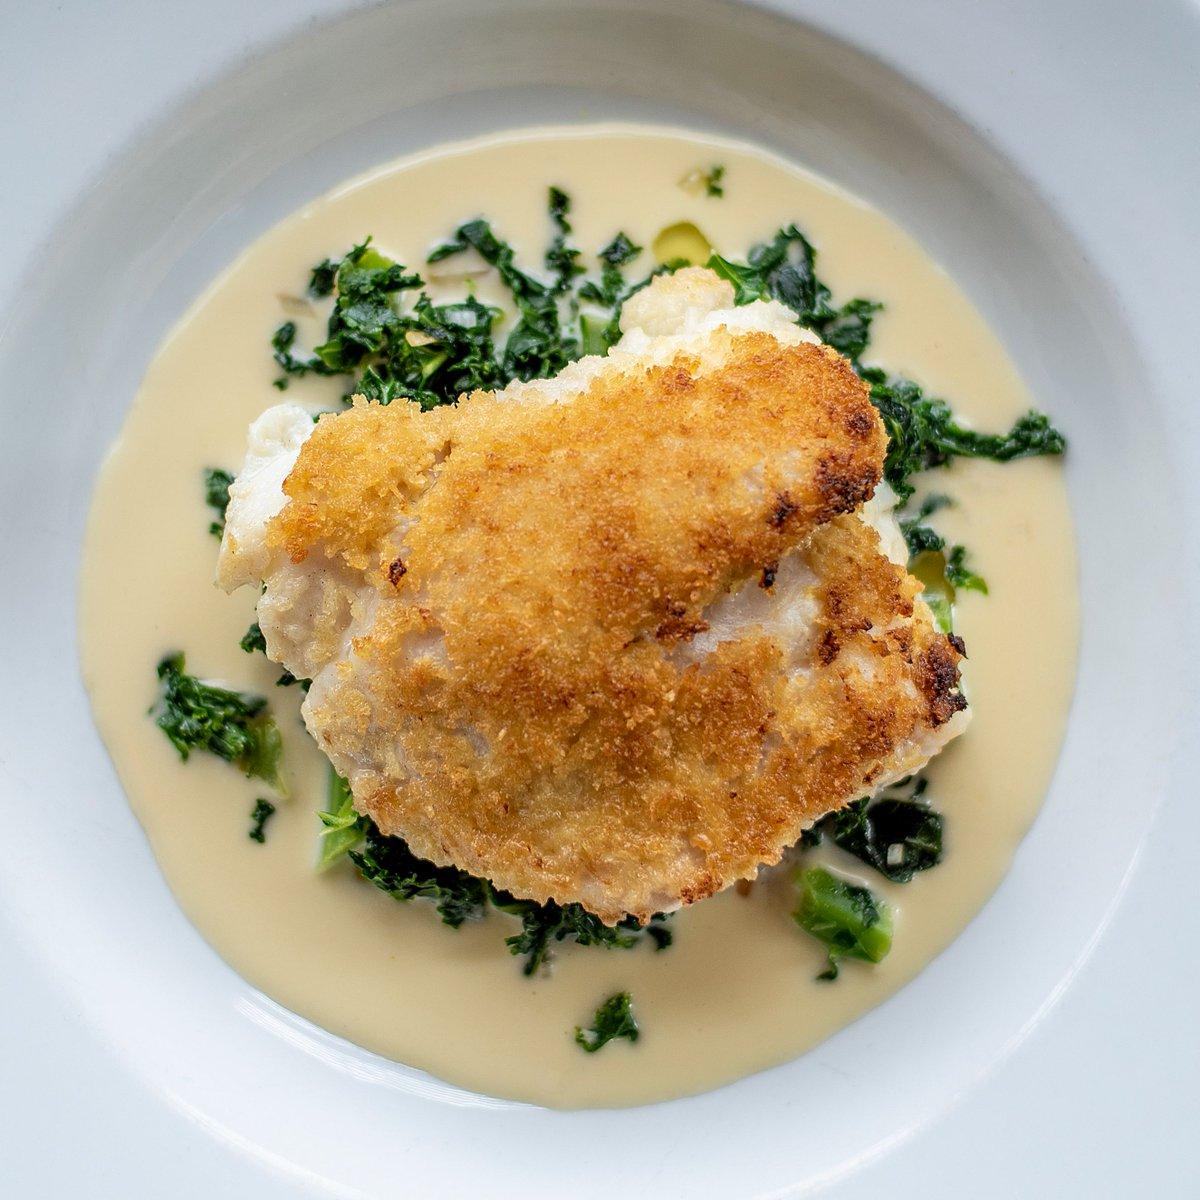 This Horseradish Crusted Black Grouper is a seafood lovers dream!  . . . #atlanta #atlantaeats #atlantarestaurants #atlantafoodblogger #foodgasm #foodphotography #todaysbest #curbside #doordash #delivery #supportlocal https://t.co/MpscIpgmeN